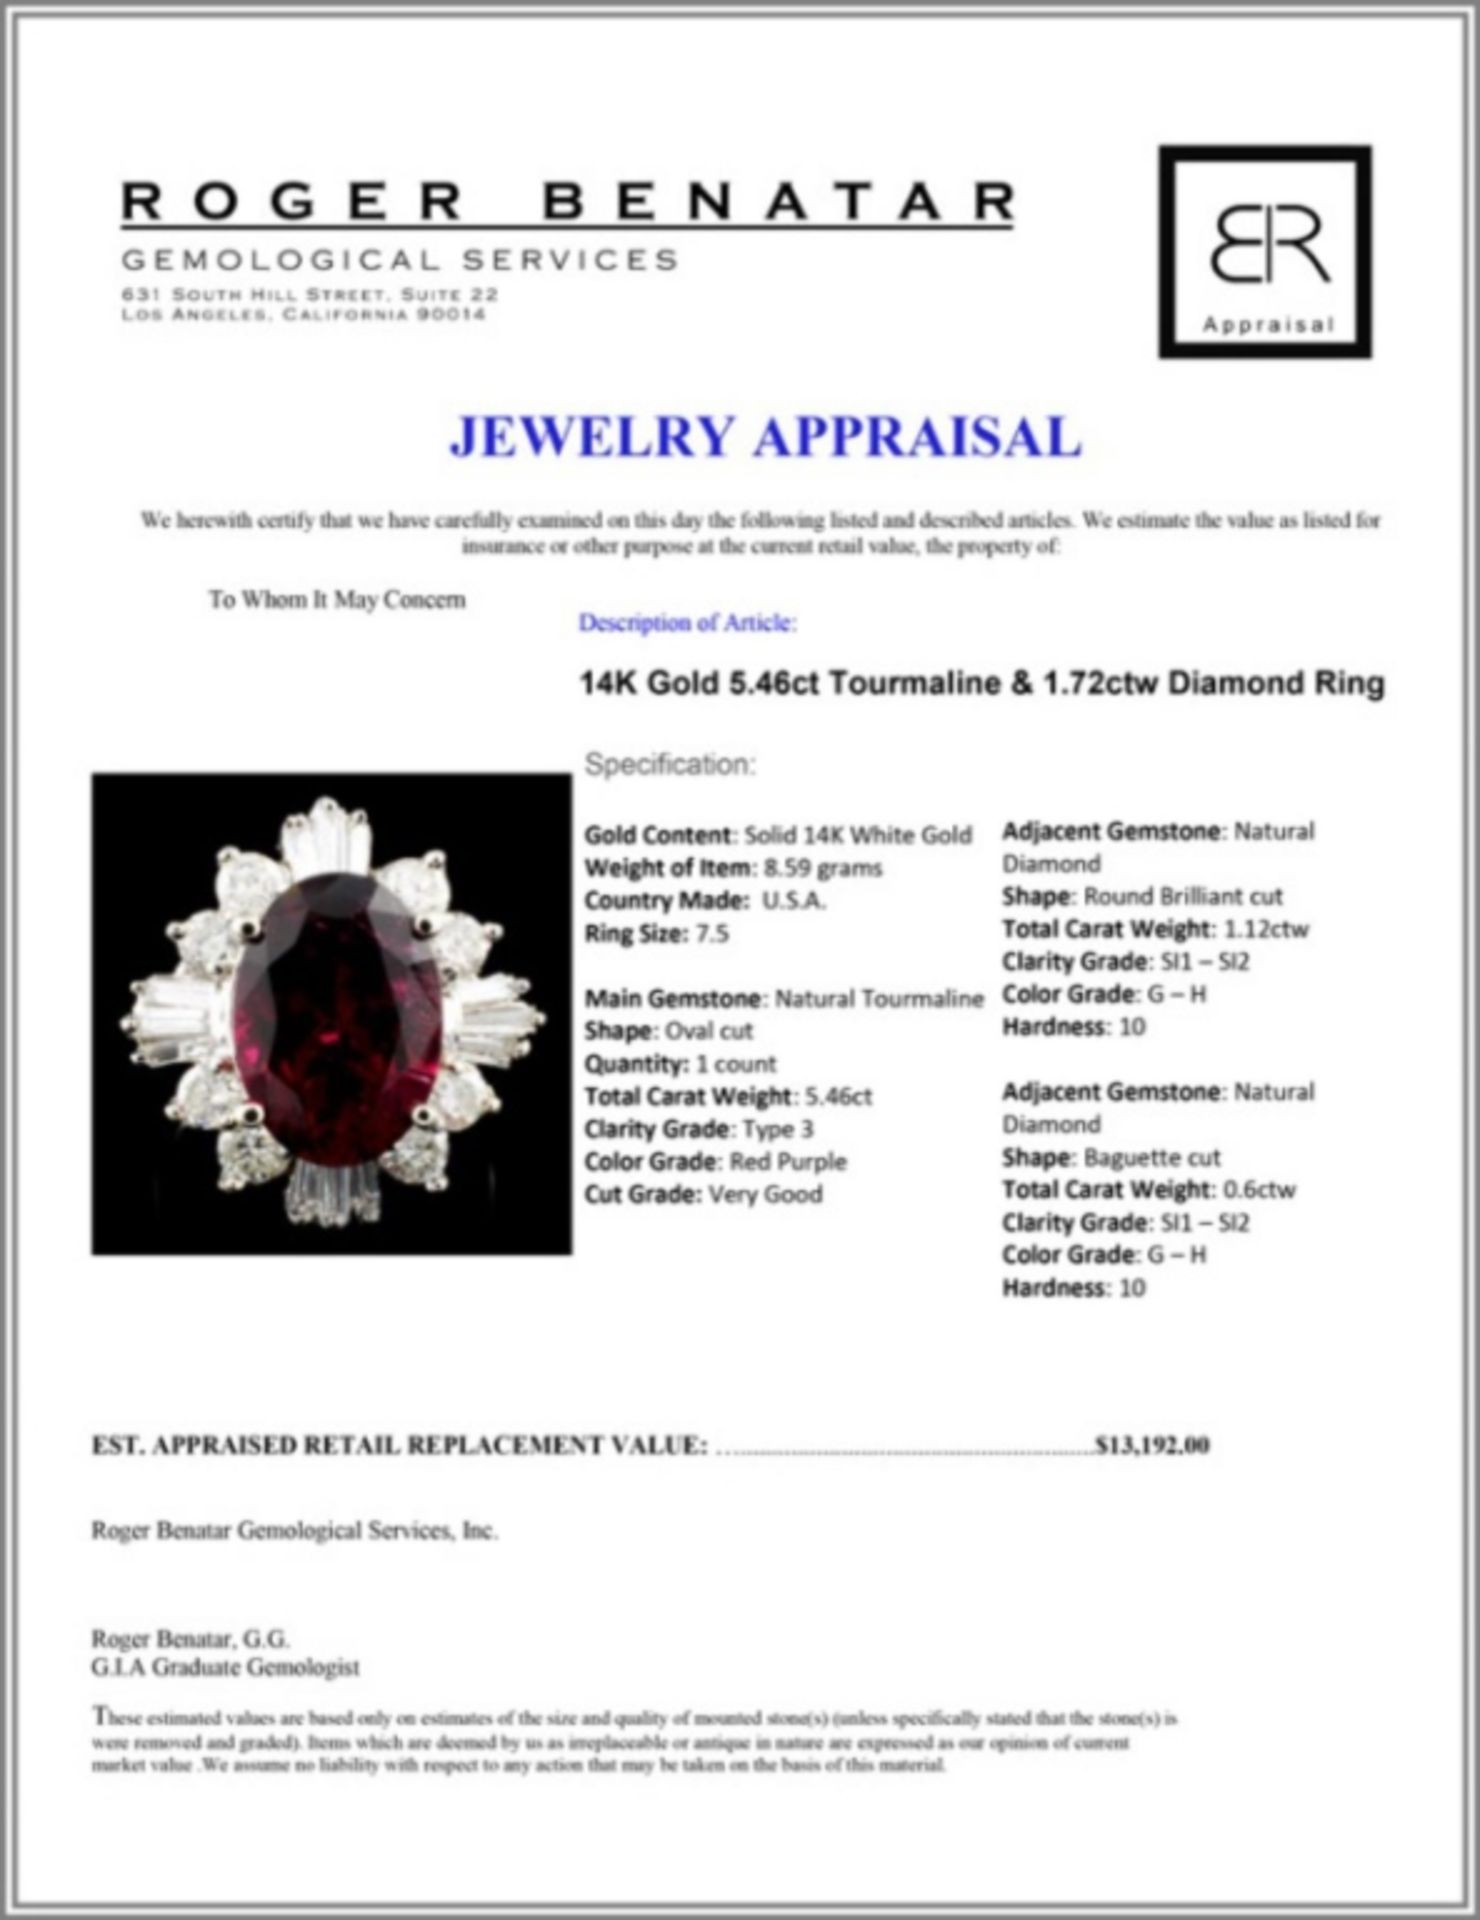 14K Gold 5.46ct Tourmaline & 1.72ctw Diamond Ring - Image 4 of 4